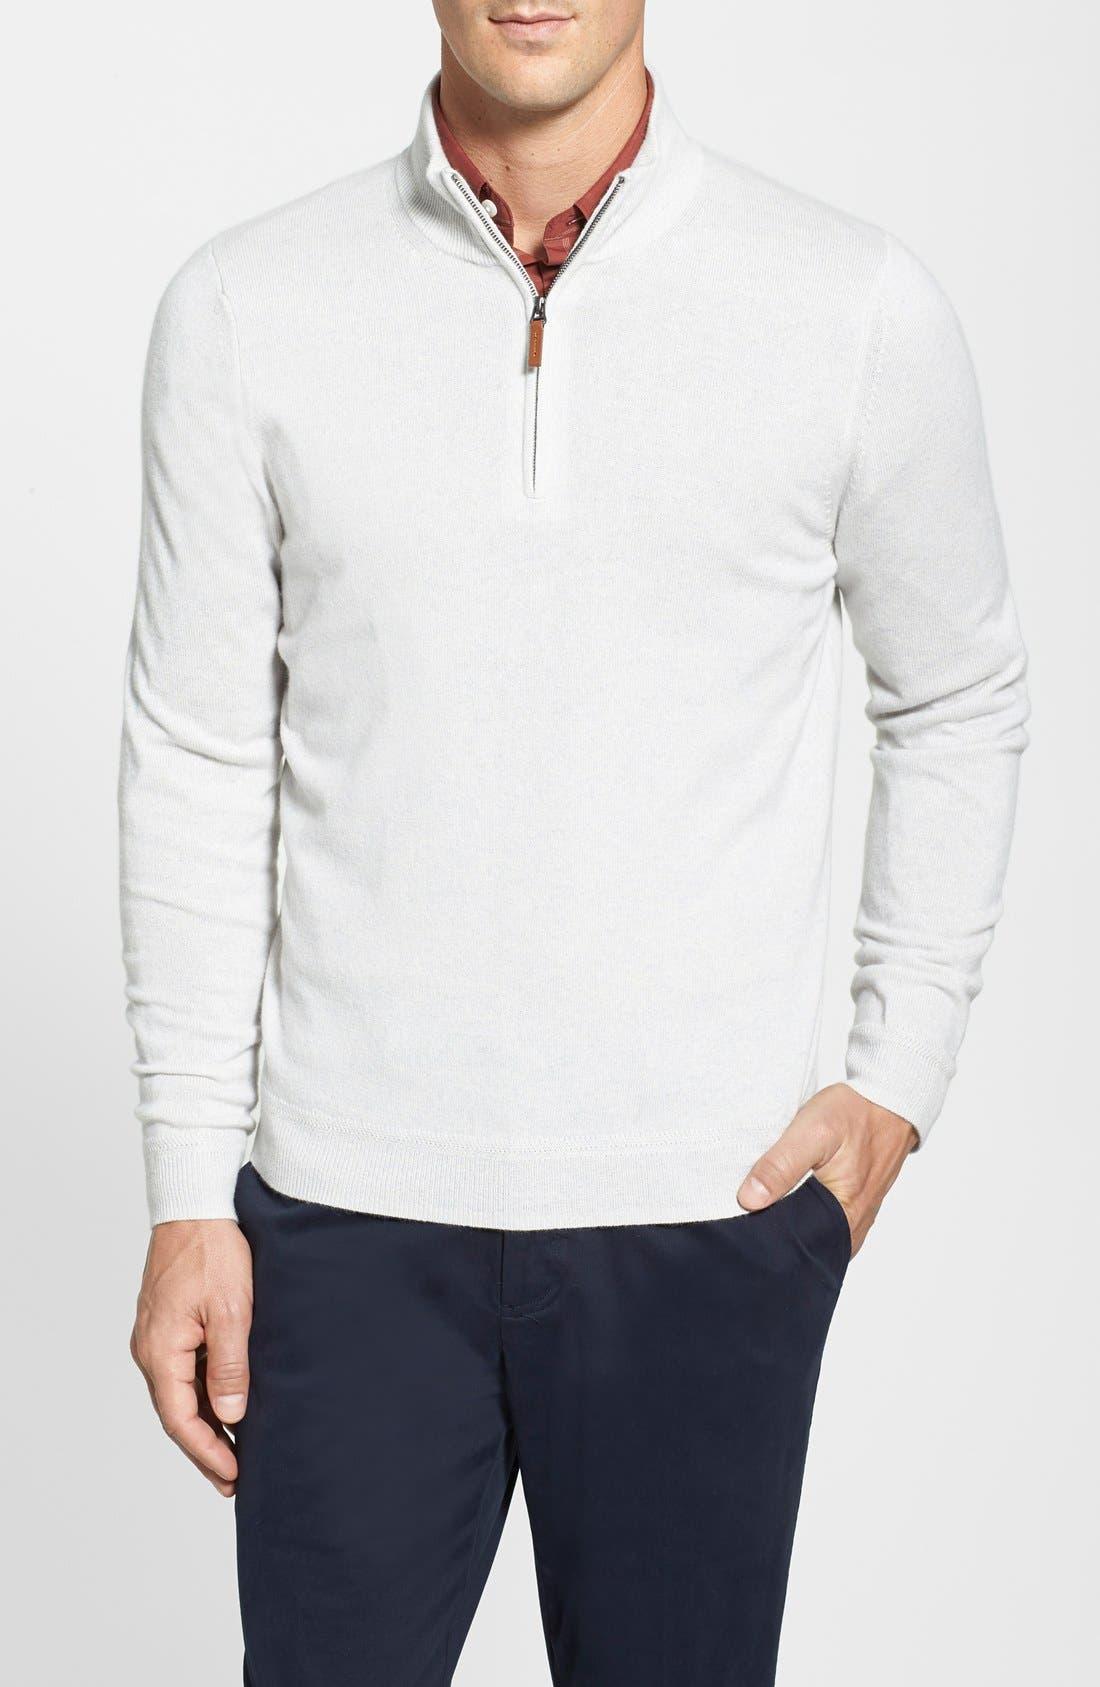 Main Image - John W. Nordstrom® Half Zip Cashmere Sweater